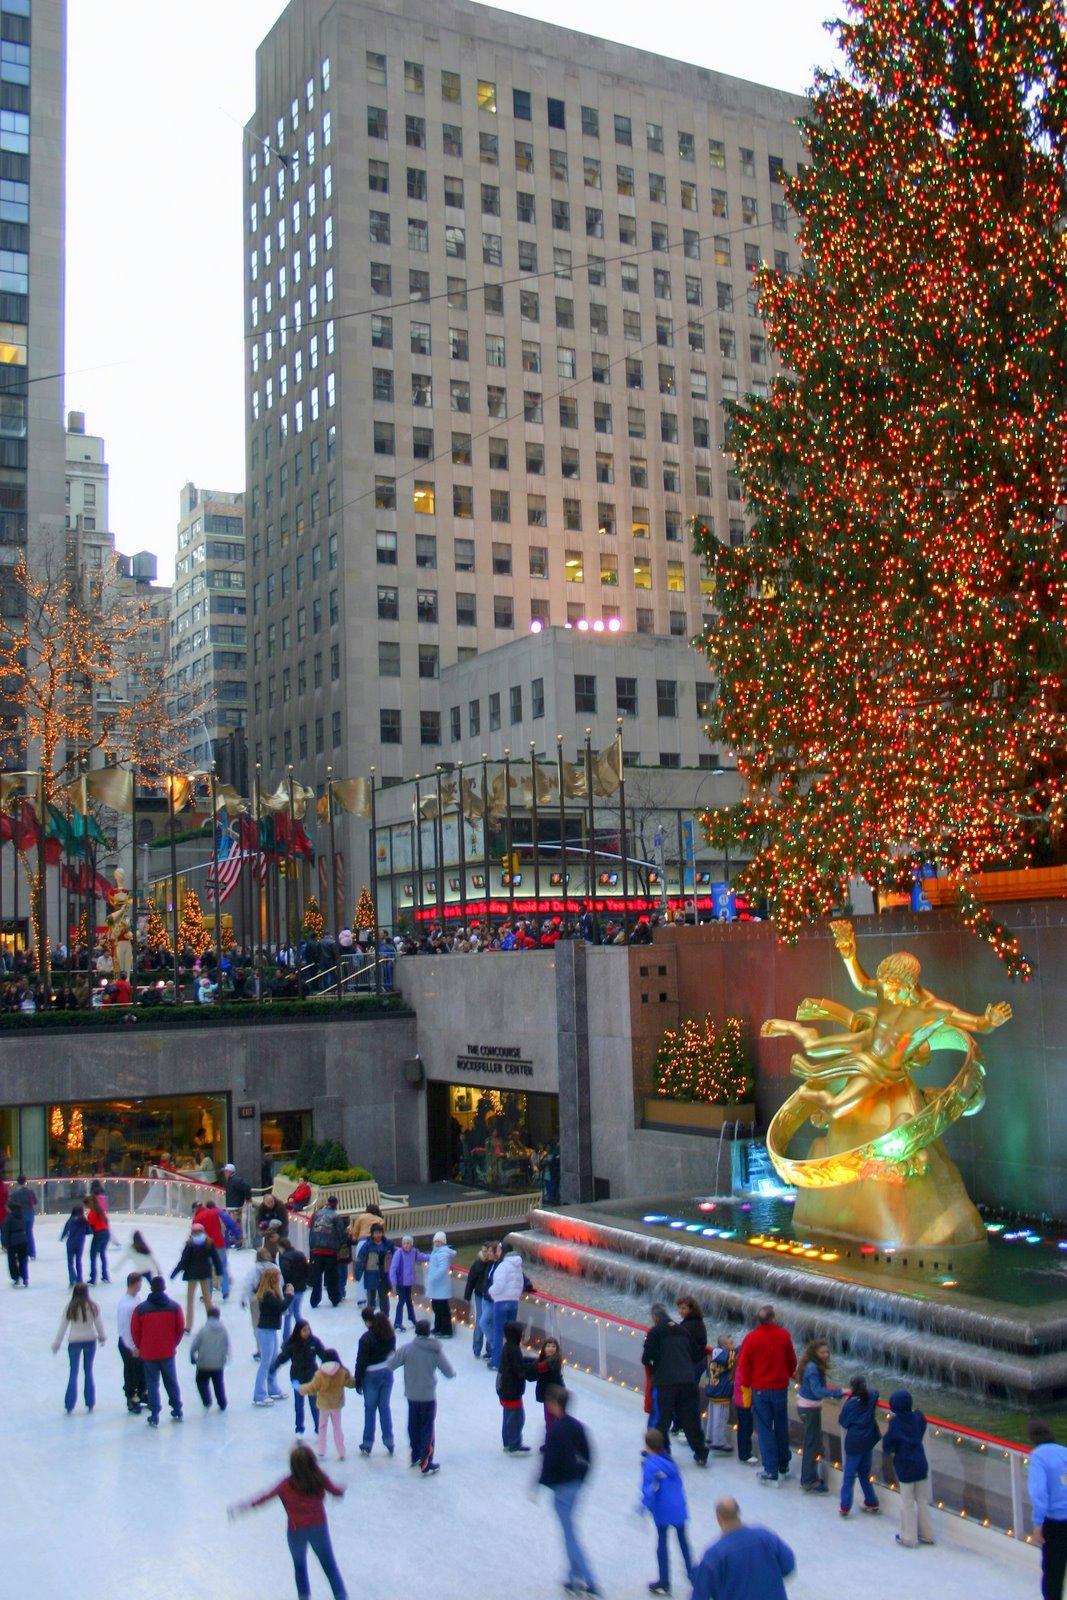 Rockefeller Plaza Christmas Tree Lighting